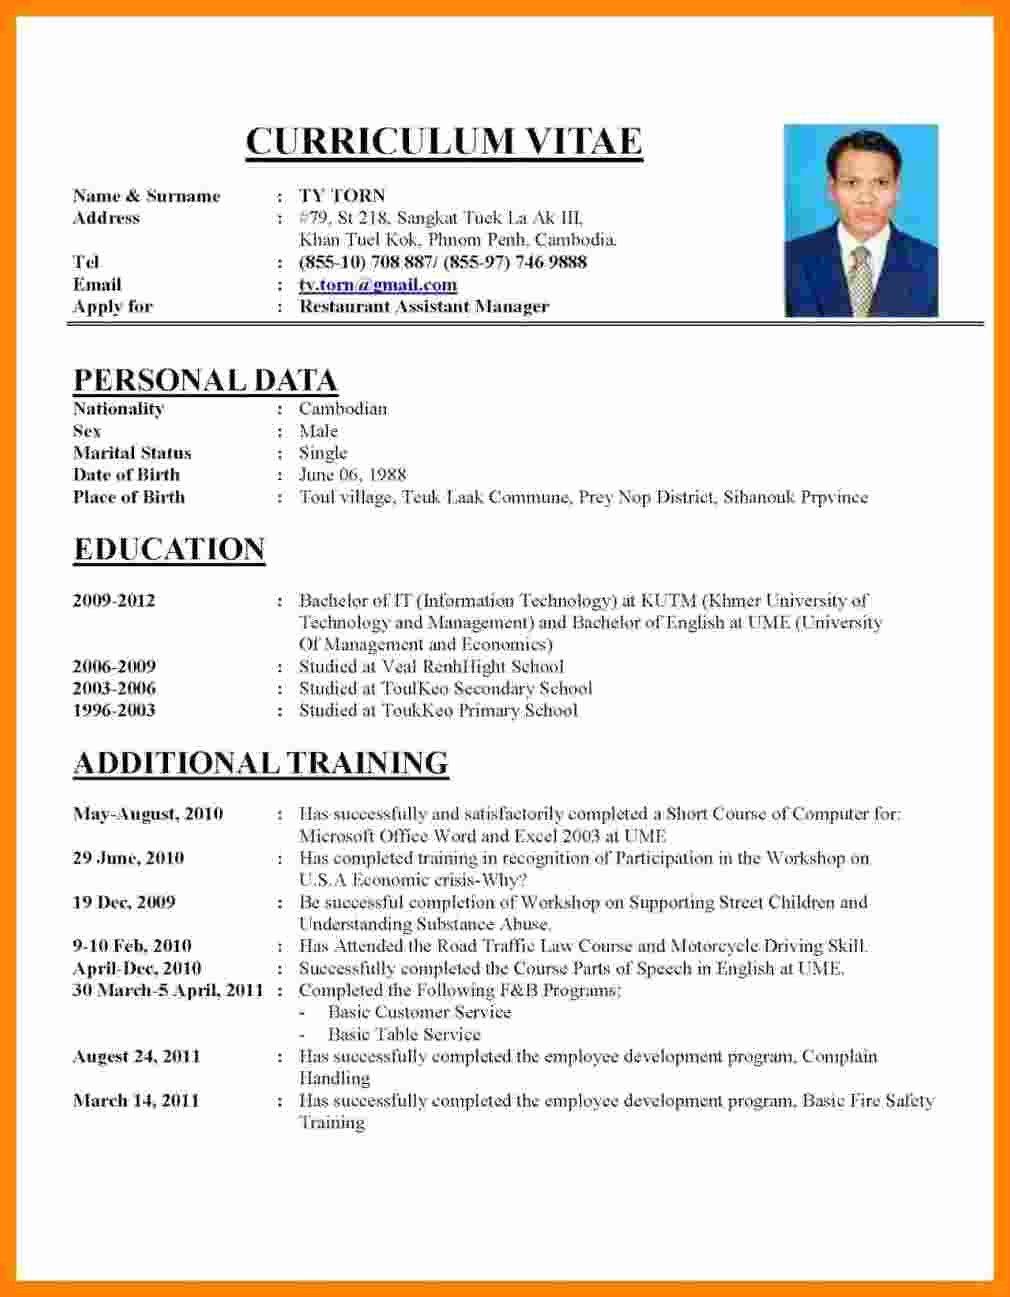 Curriculum Vitae Samples New 5 Cv Samples for Job